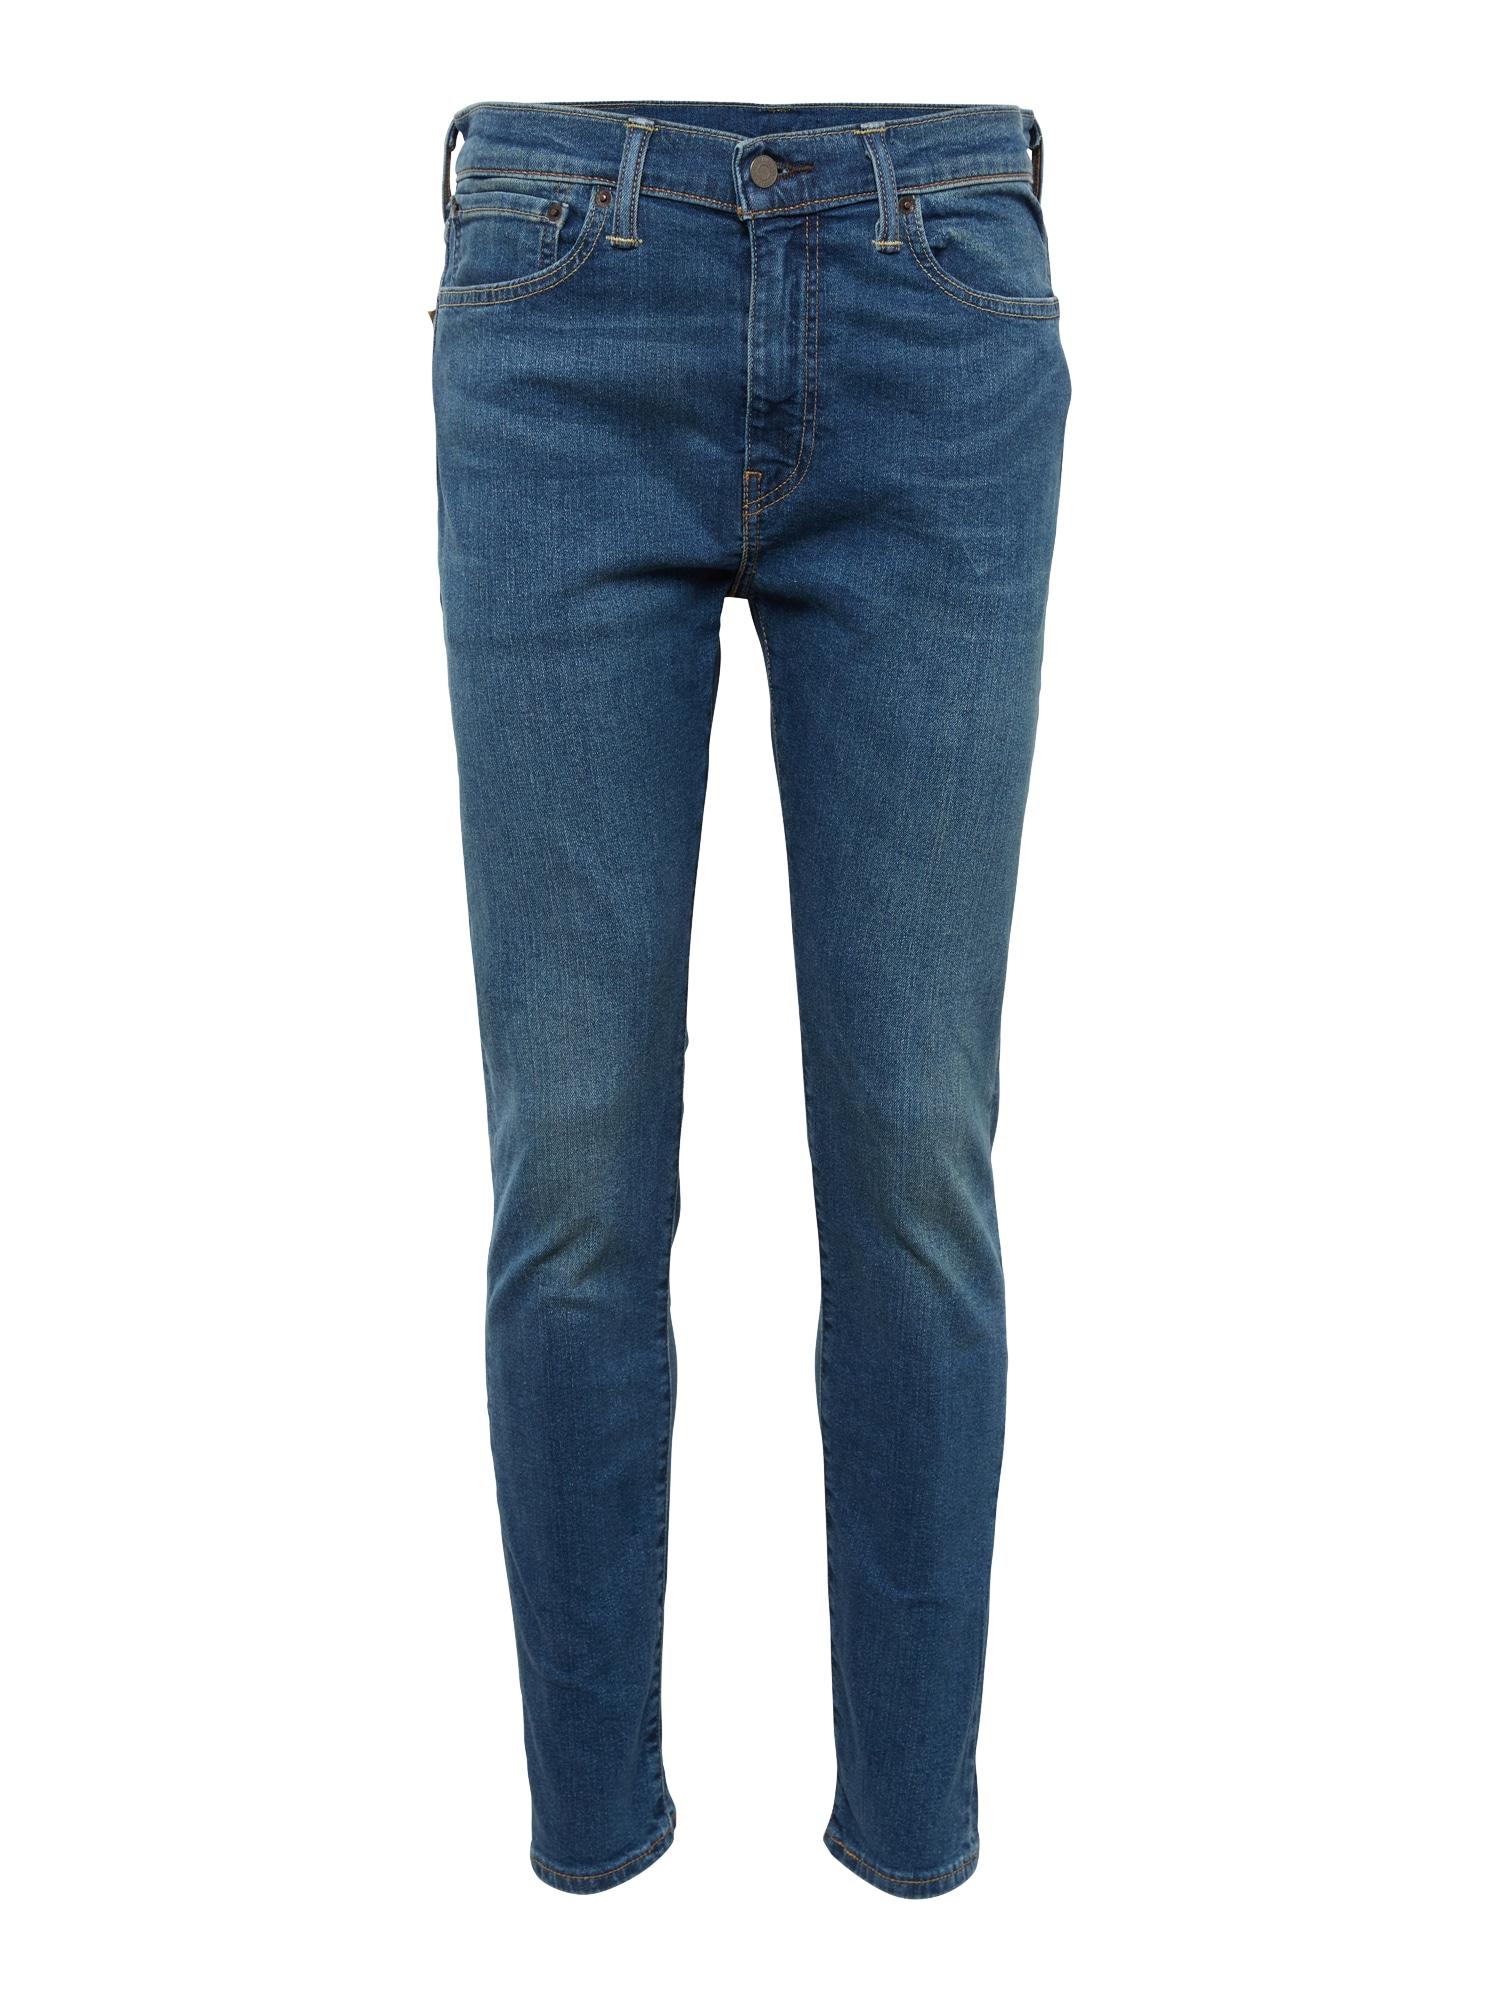 LEVI'S Heren Jeans 510™ SKINNY FIT blue denim